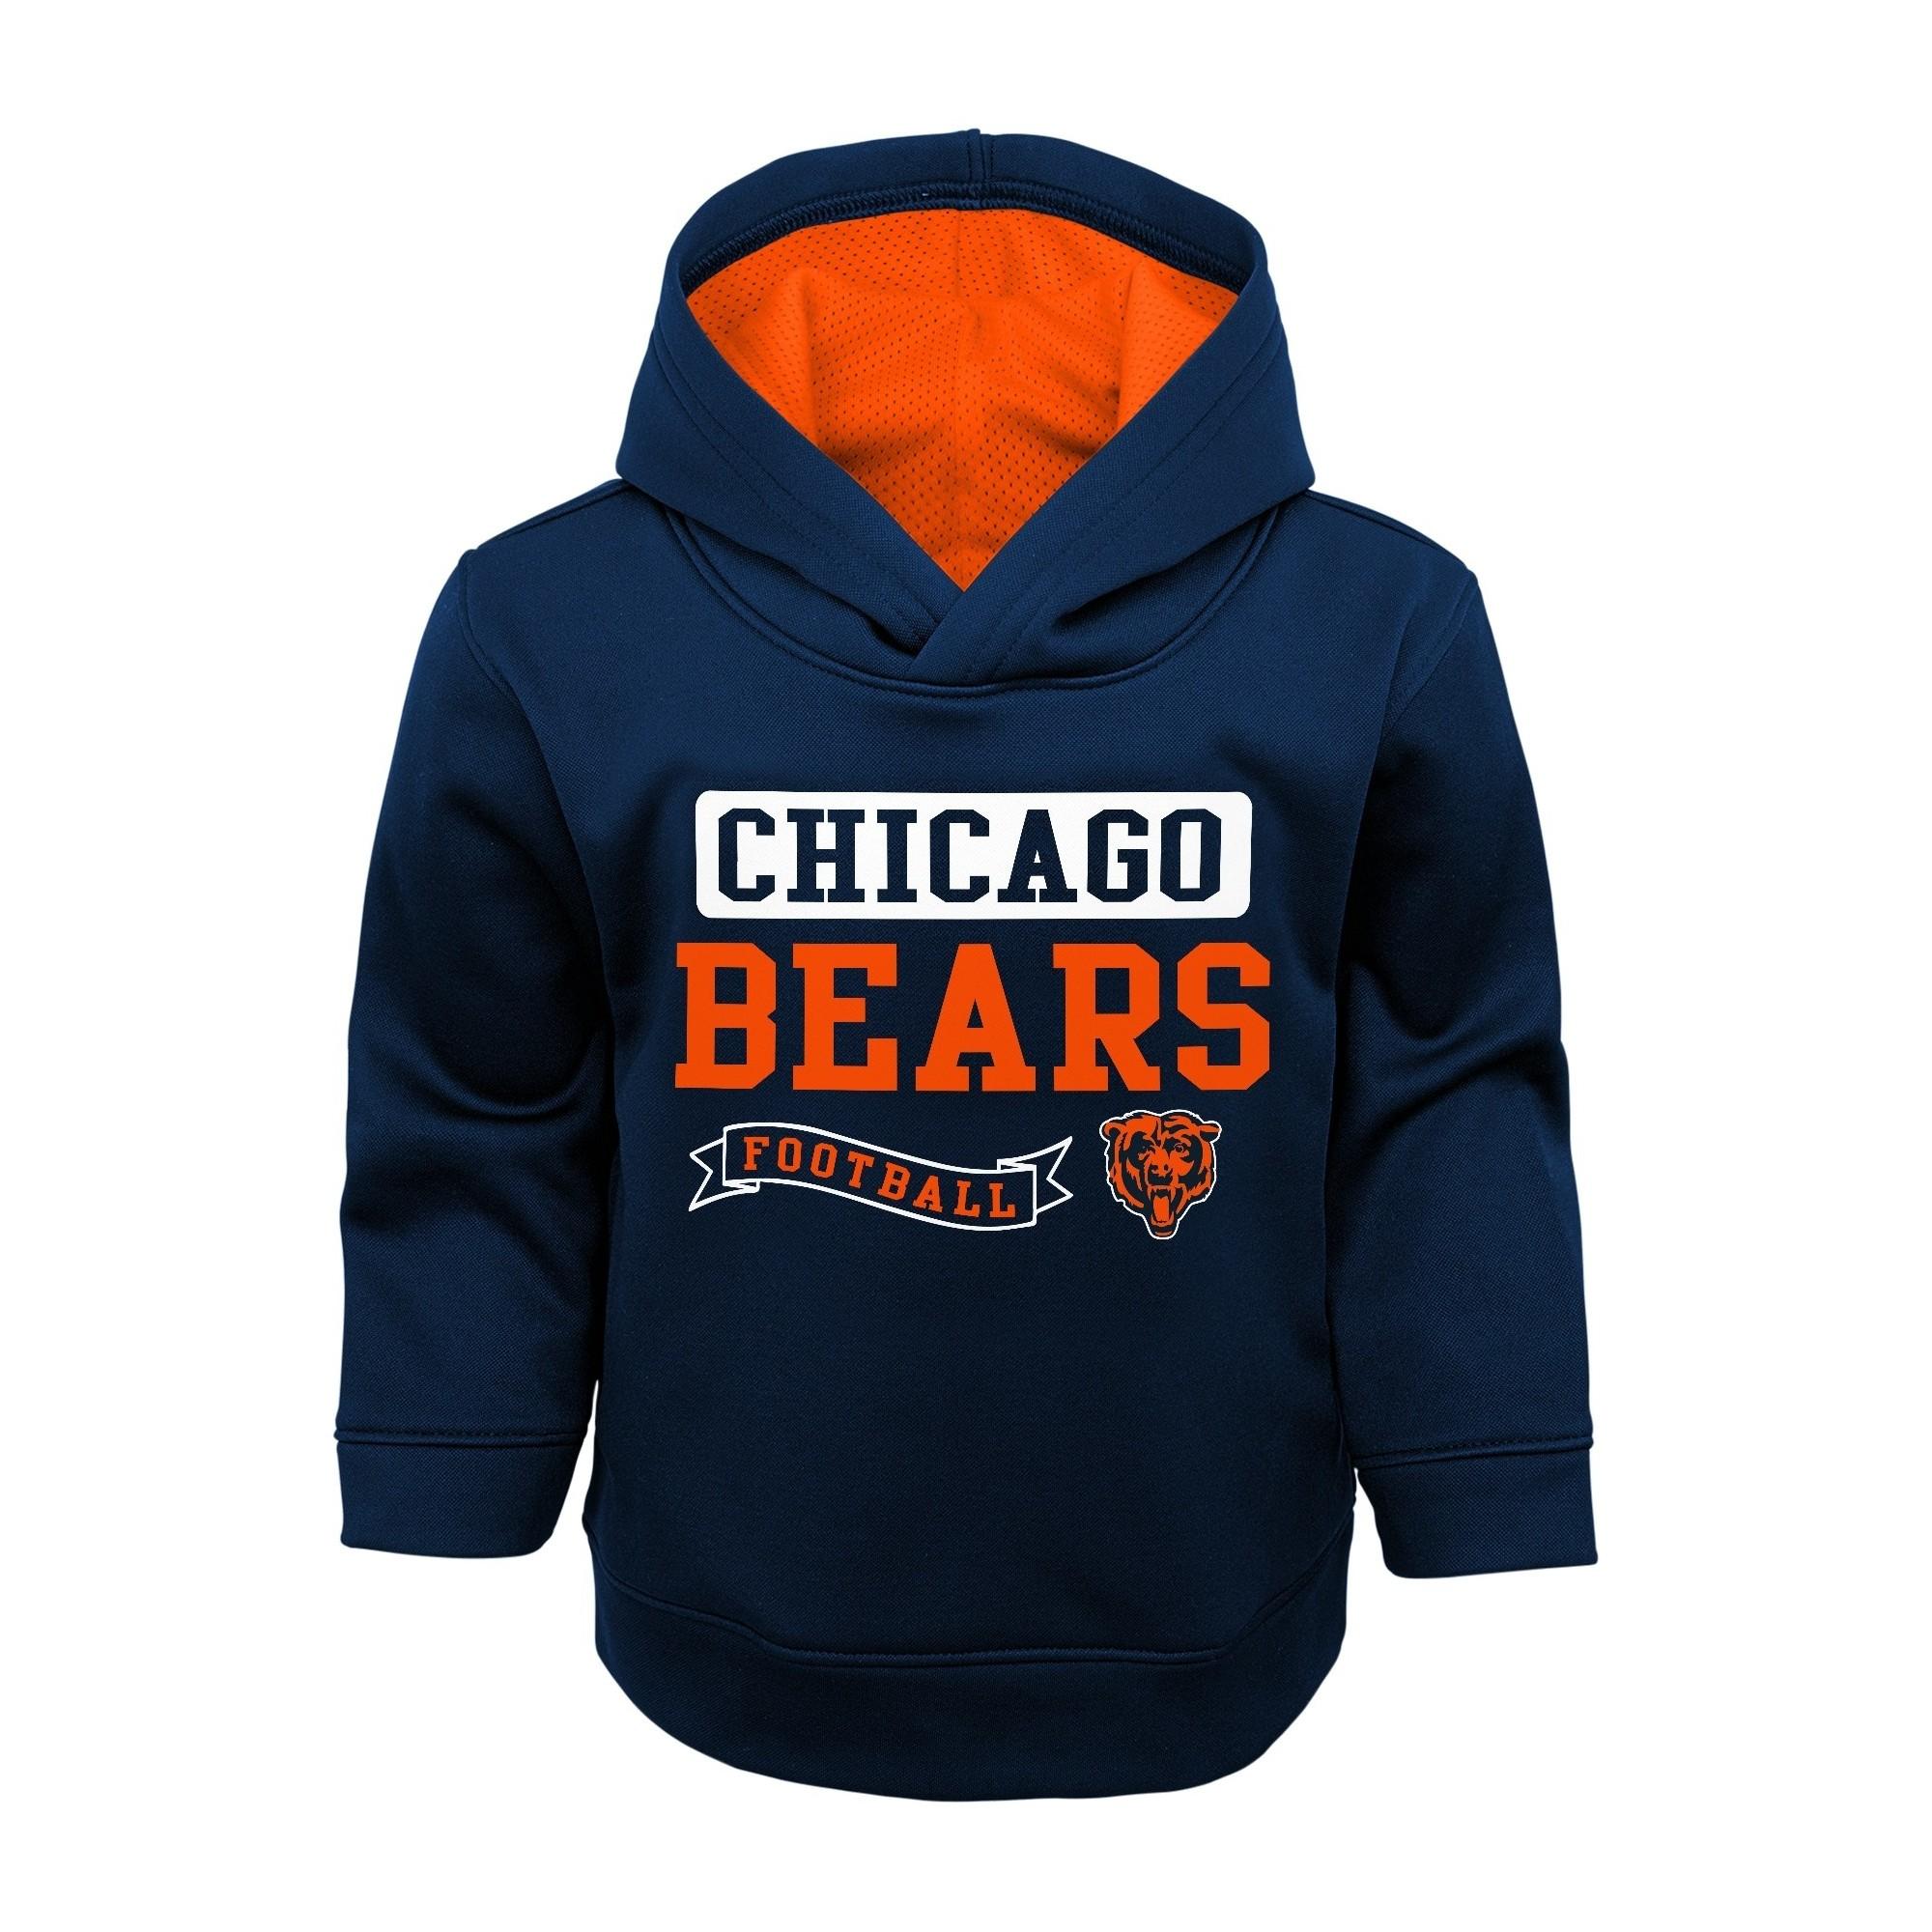 chicago bears toddler sweatshirt